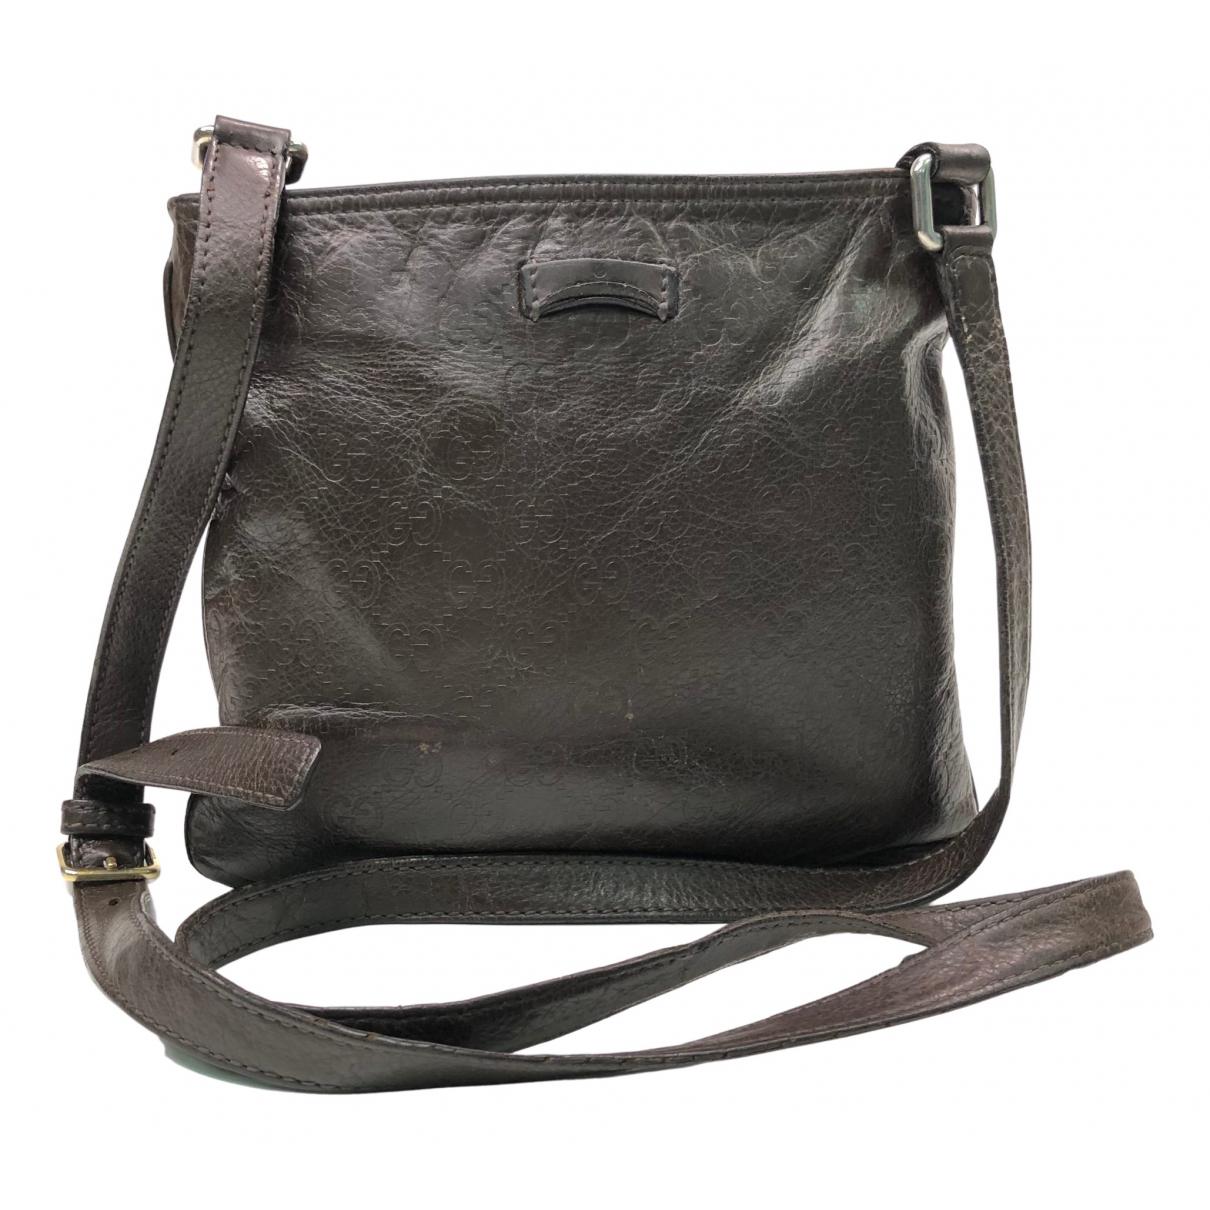 Gucci N Brown Leather bag for Men N